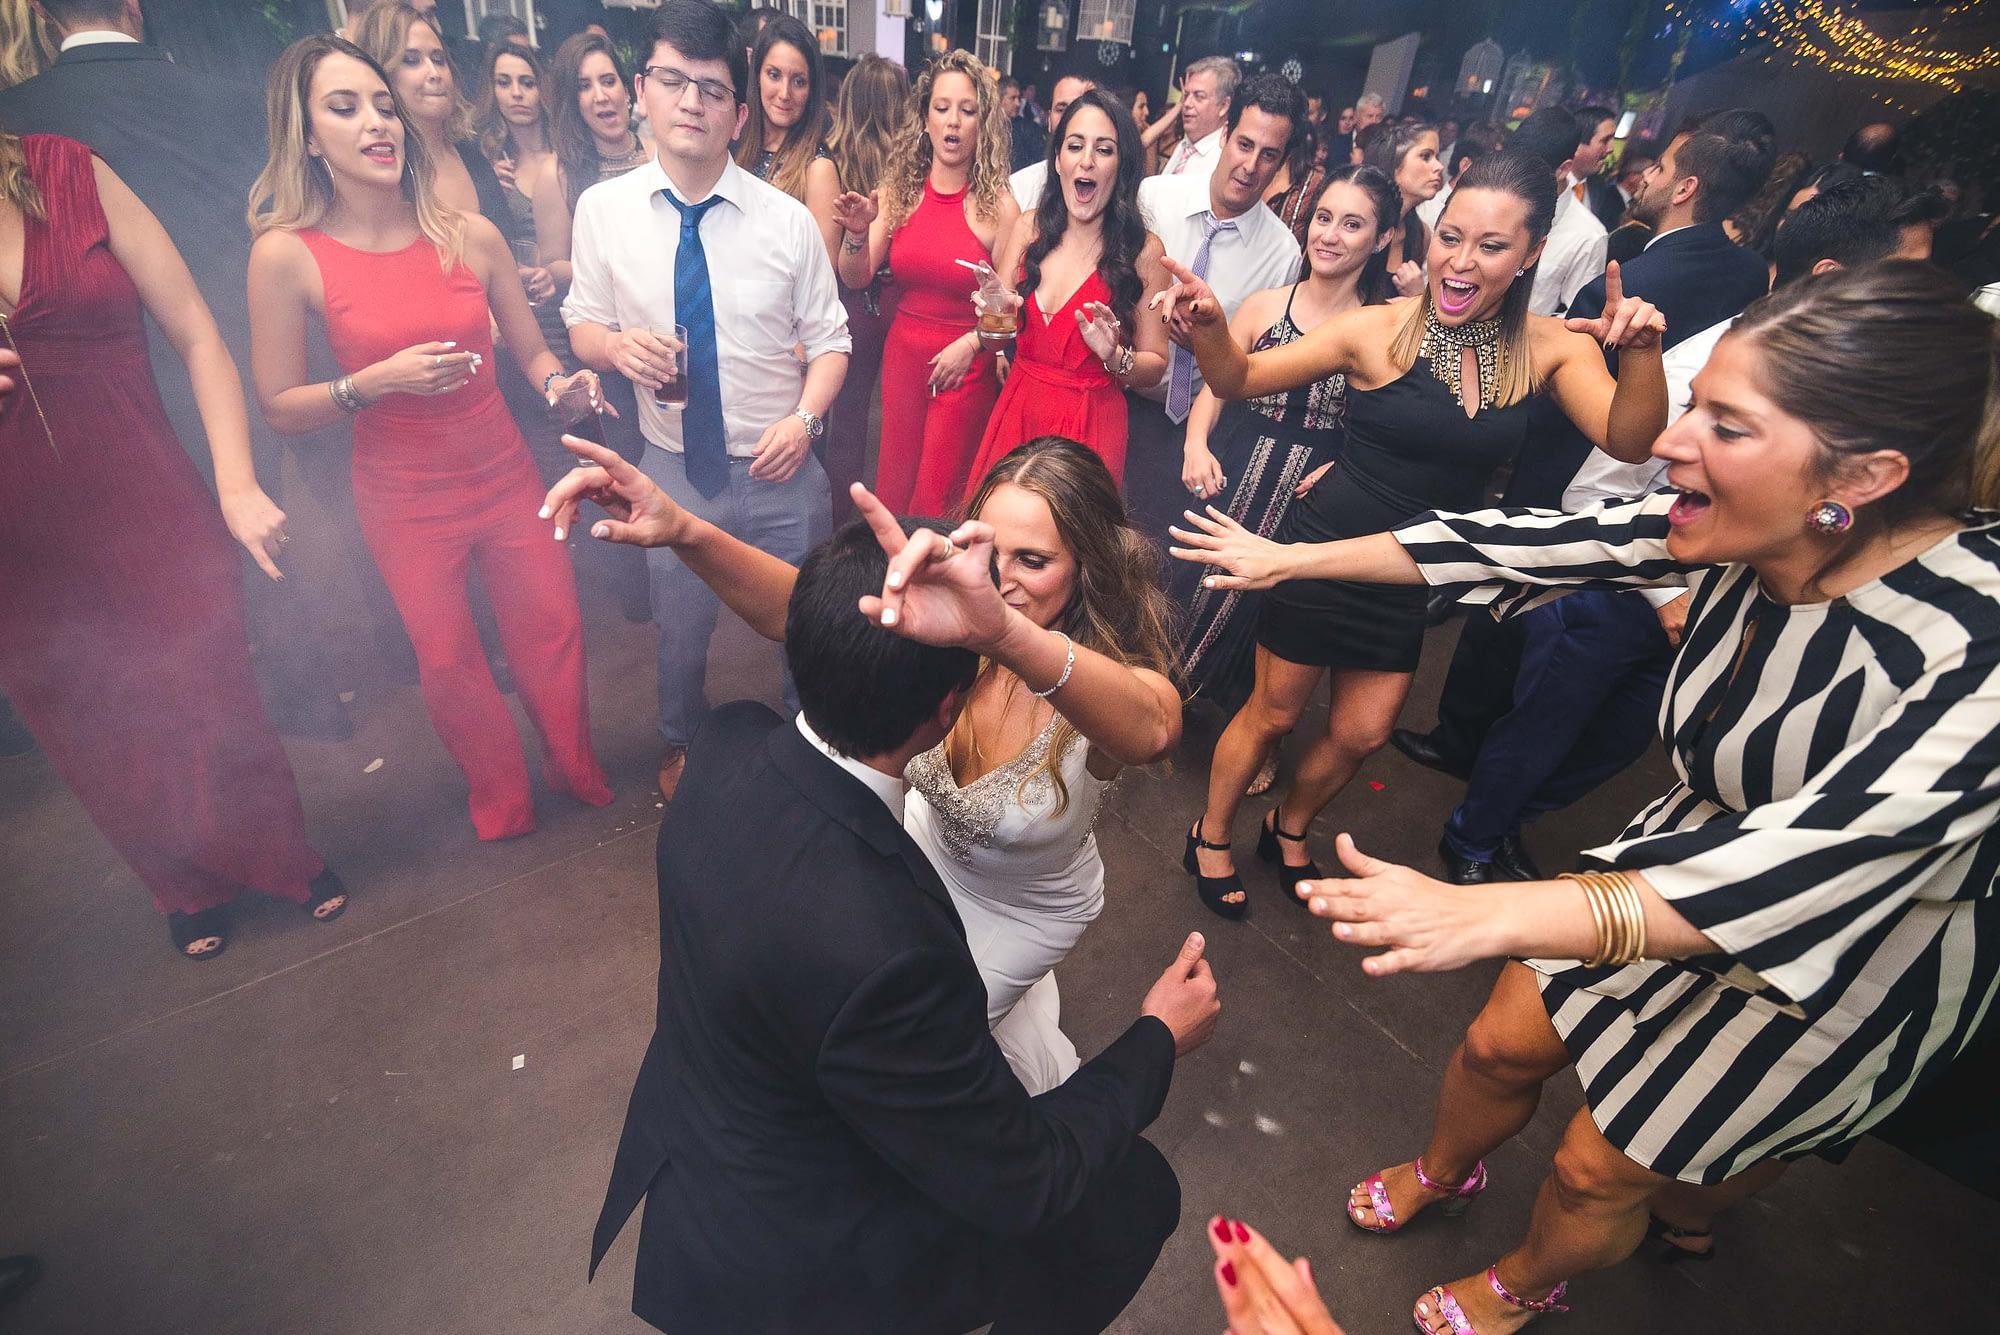 fotografo de matrimonios santiago- fotografo documental de matrimonios-club hipico-casa blanca-fiesta